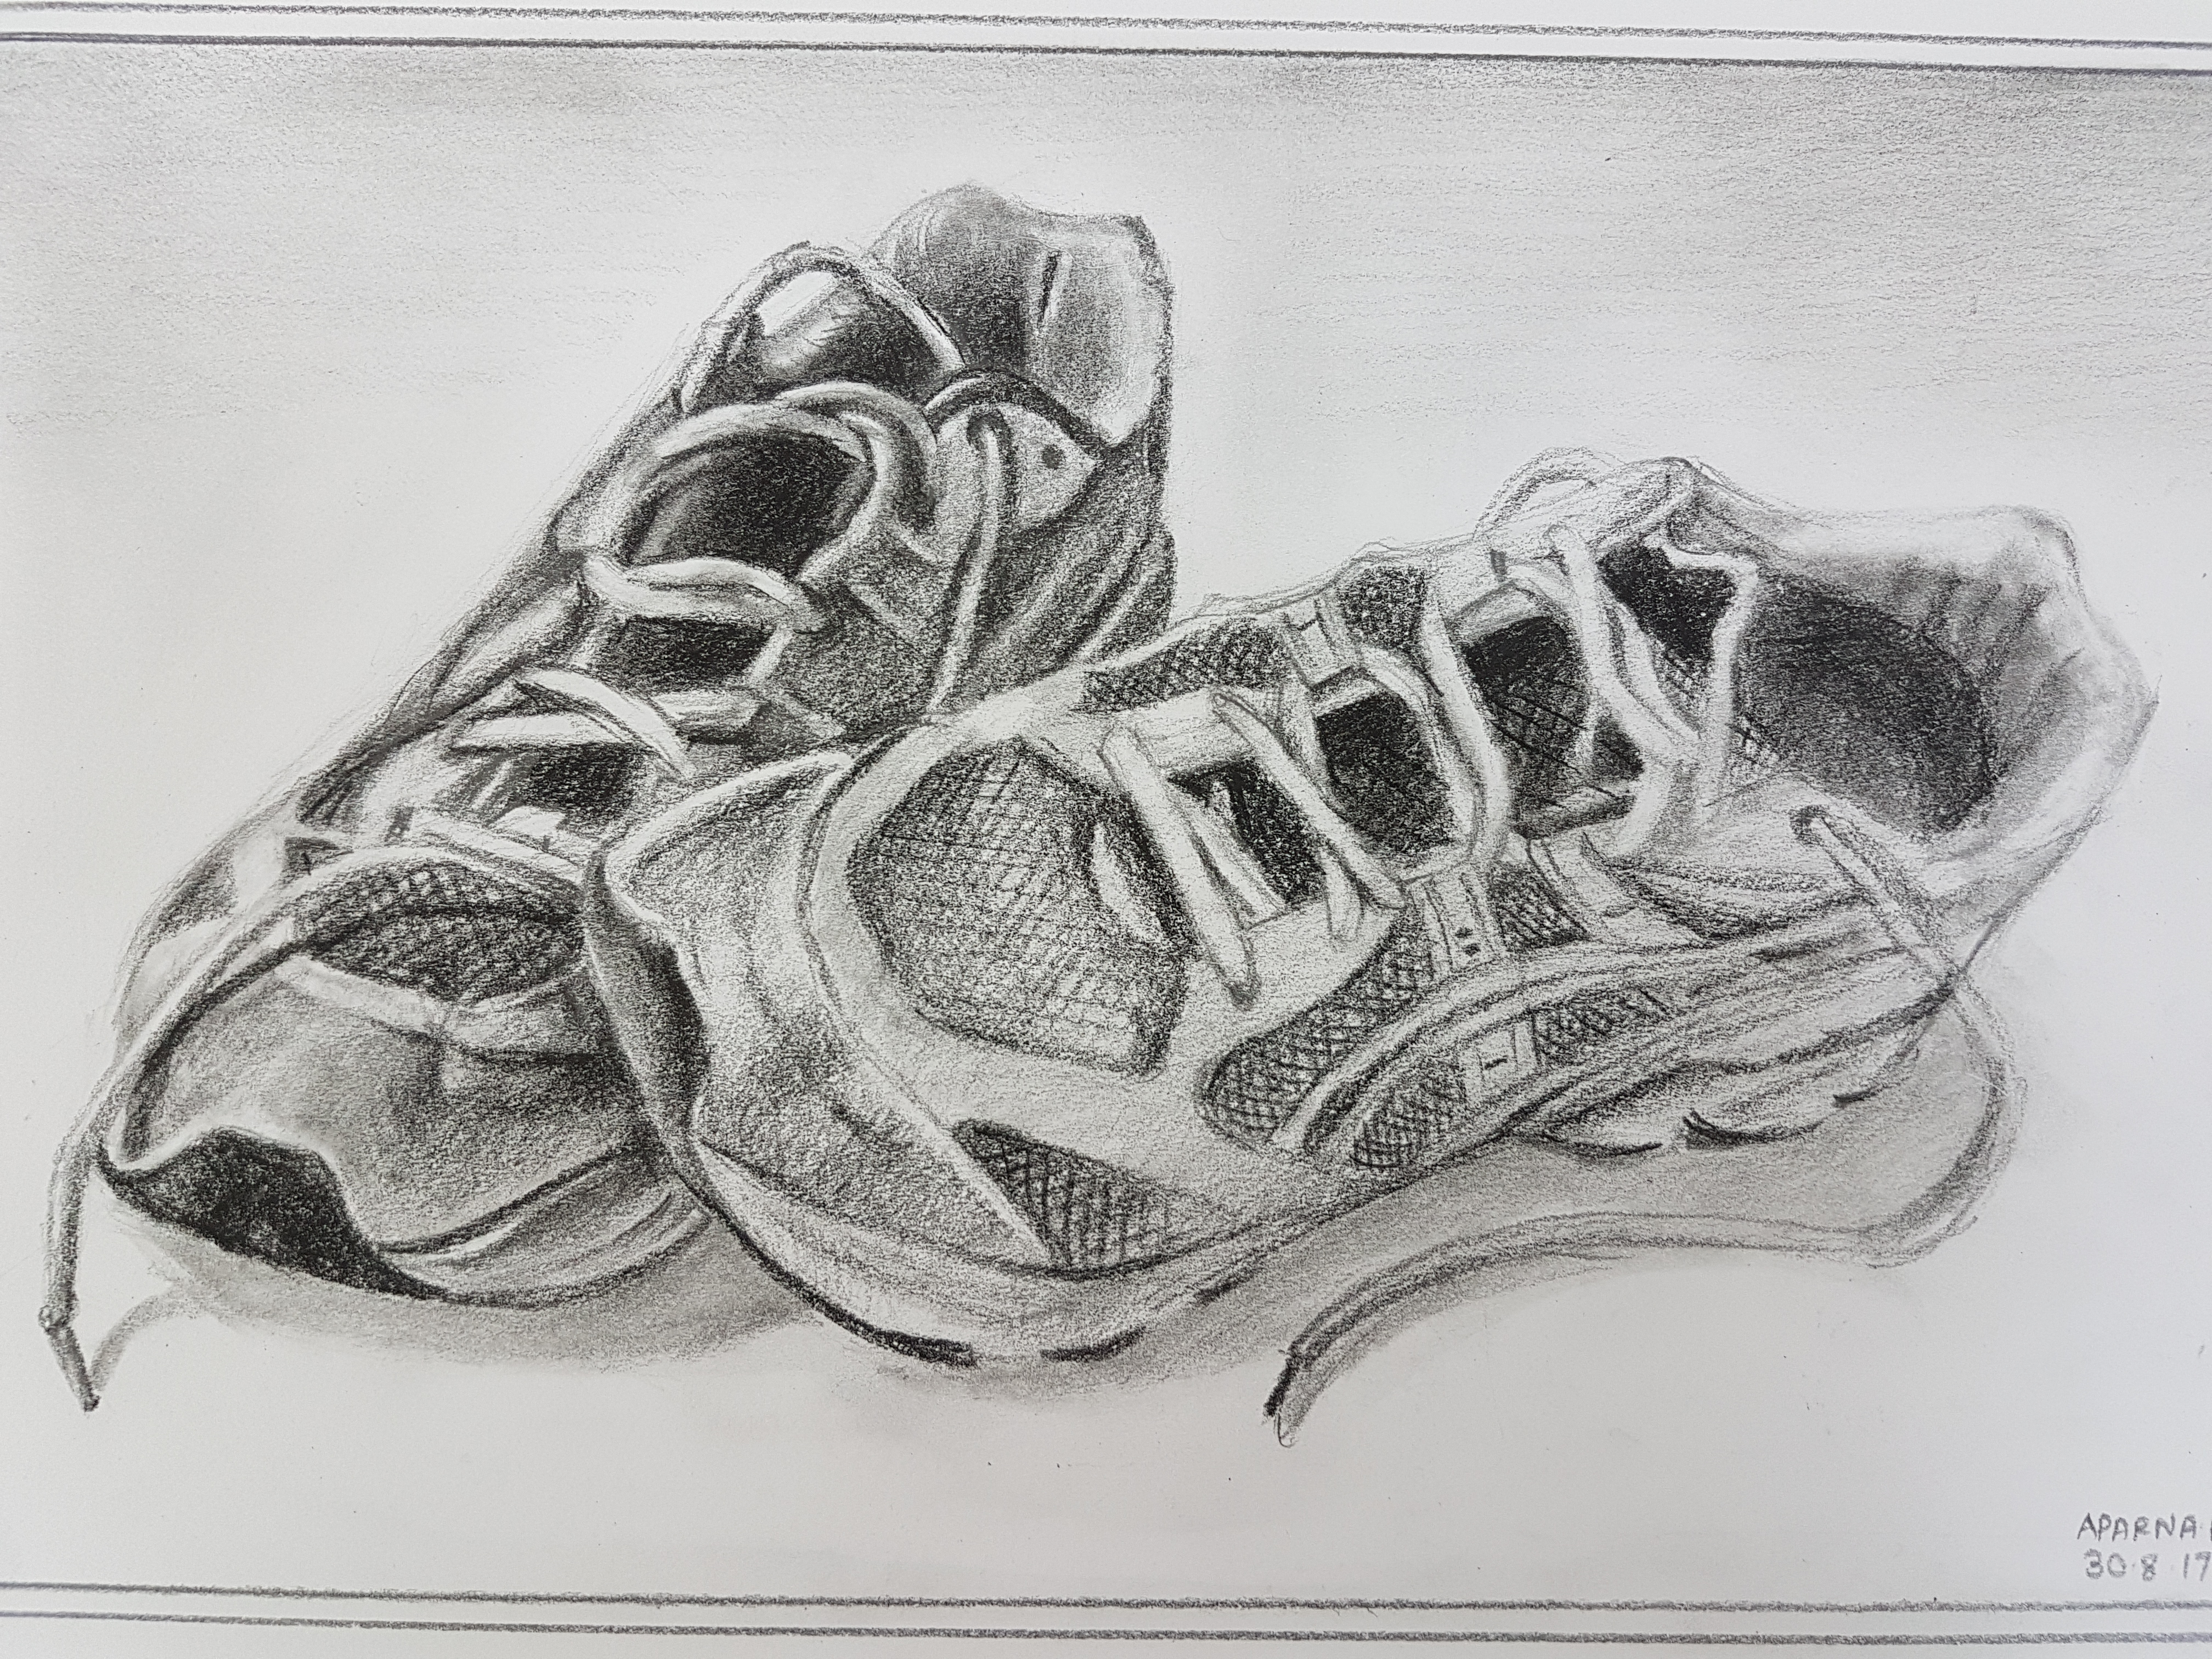 Tennis Shoe of Aparna